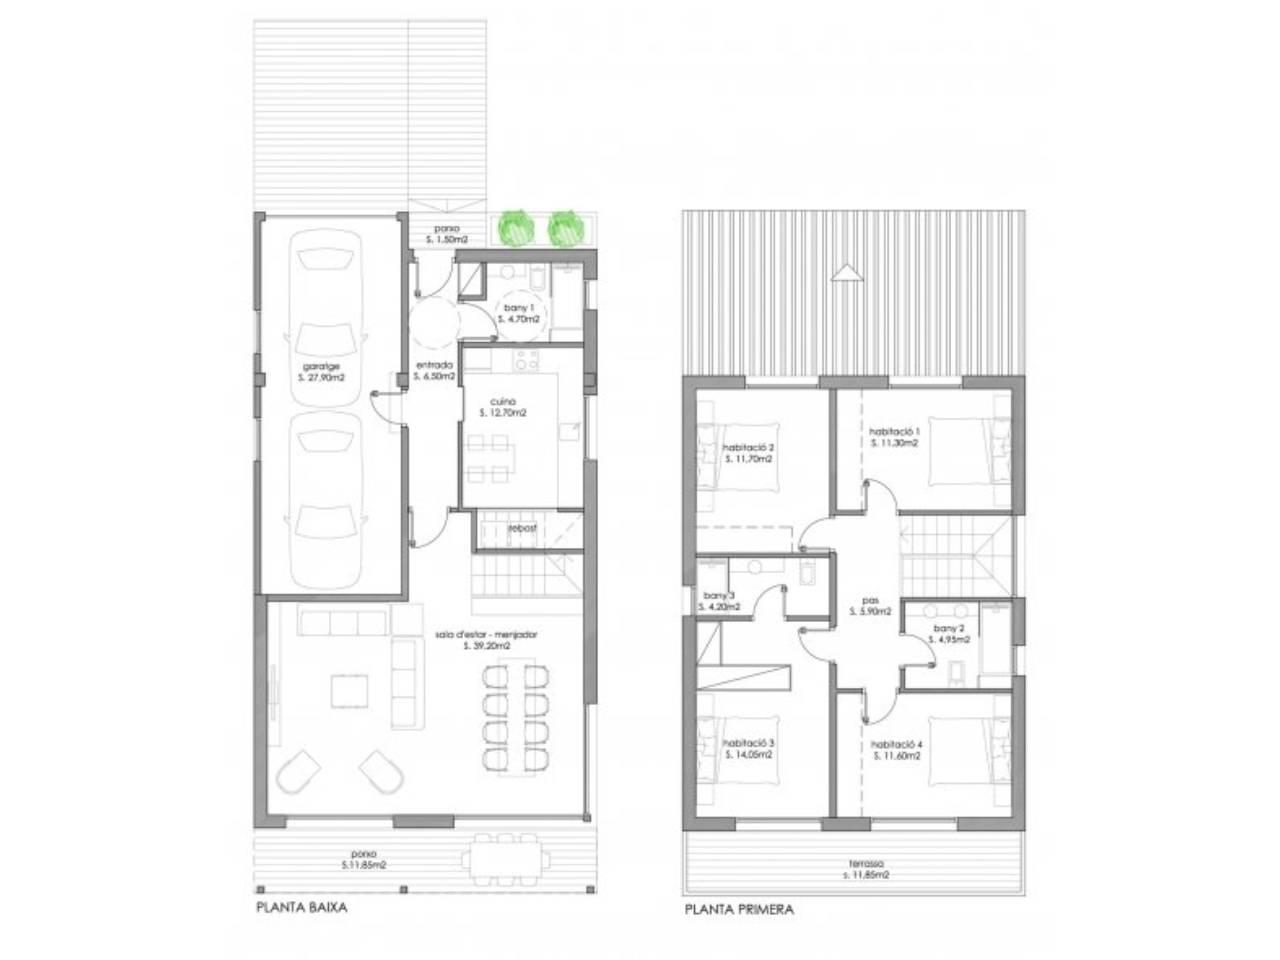 060347 - GARRIGUELLA Maison modèle RODA